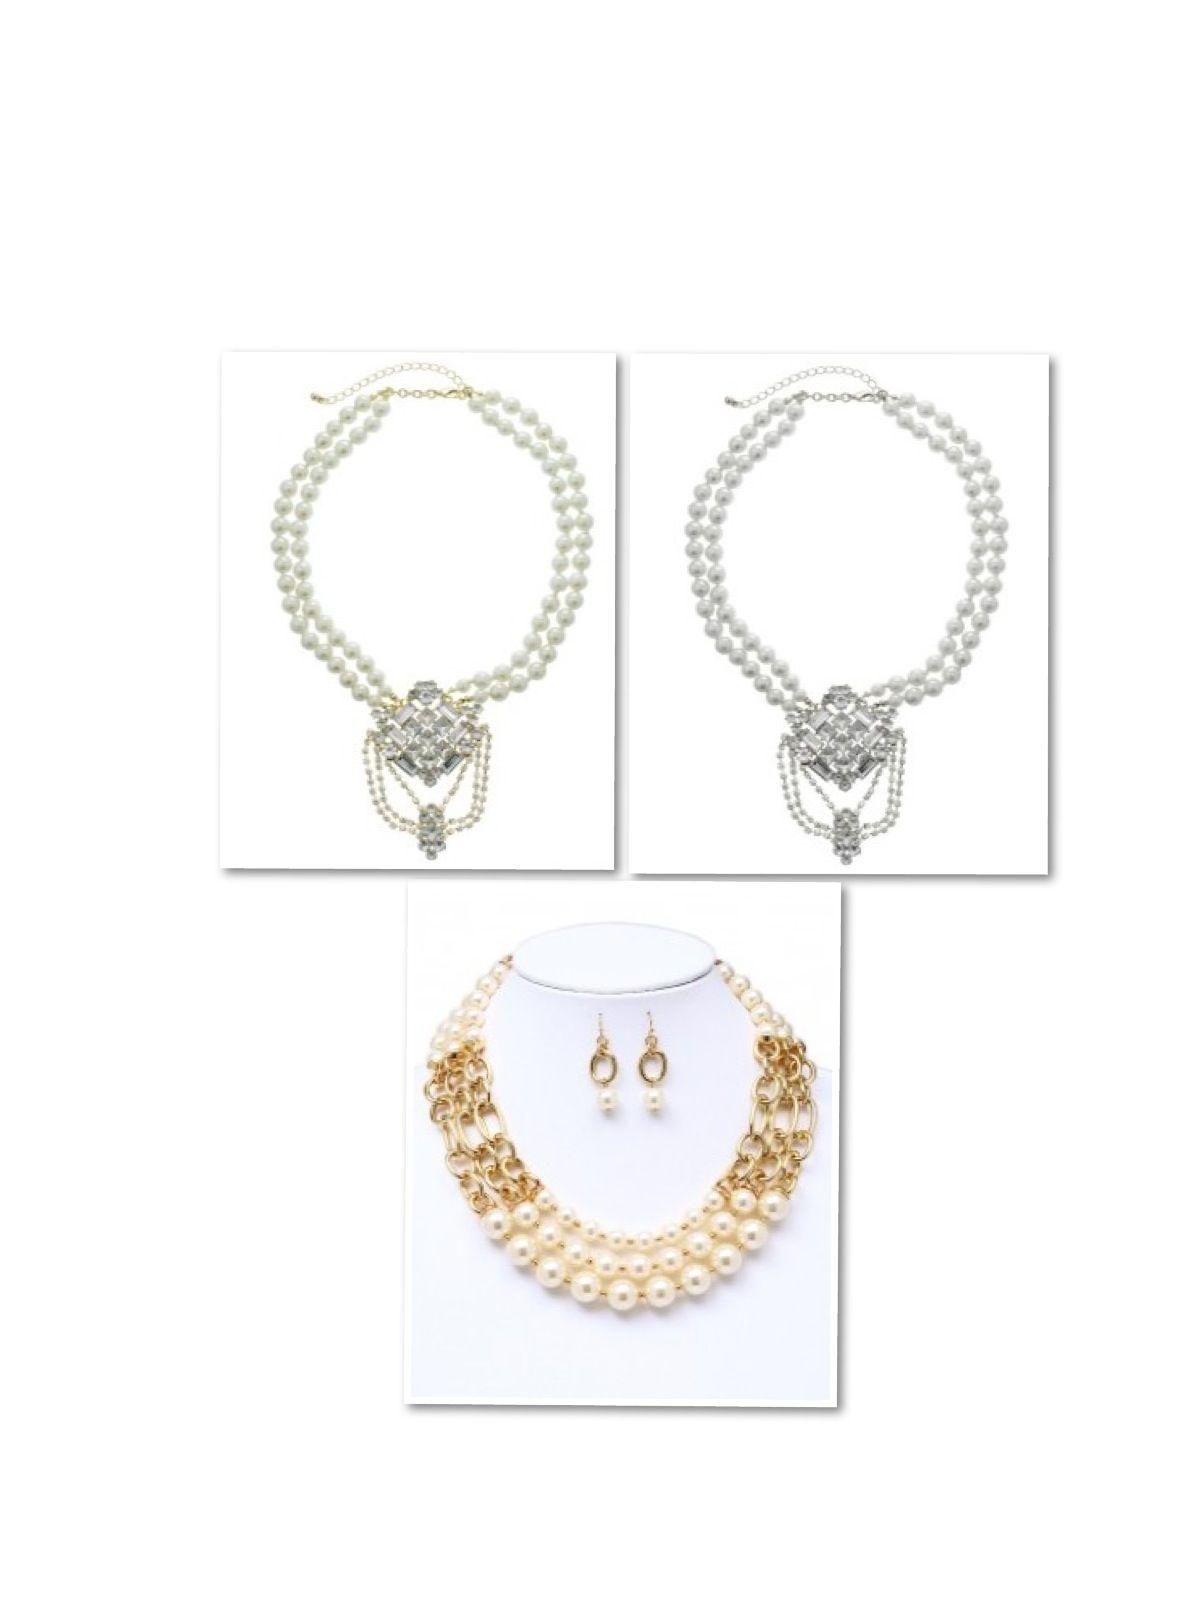 Dmonaco designs jewelry selection necklaces pearls designer